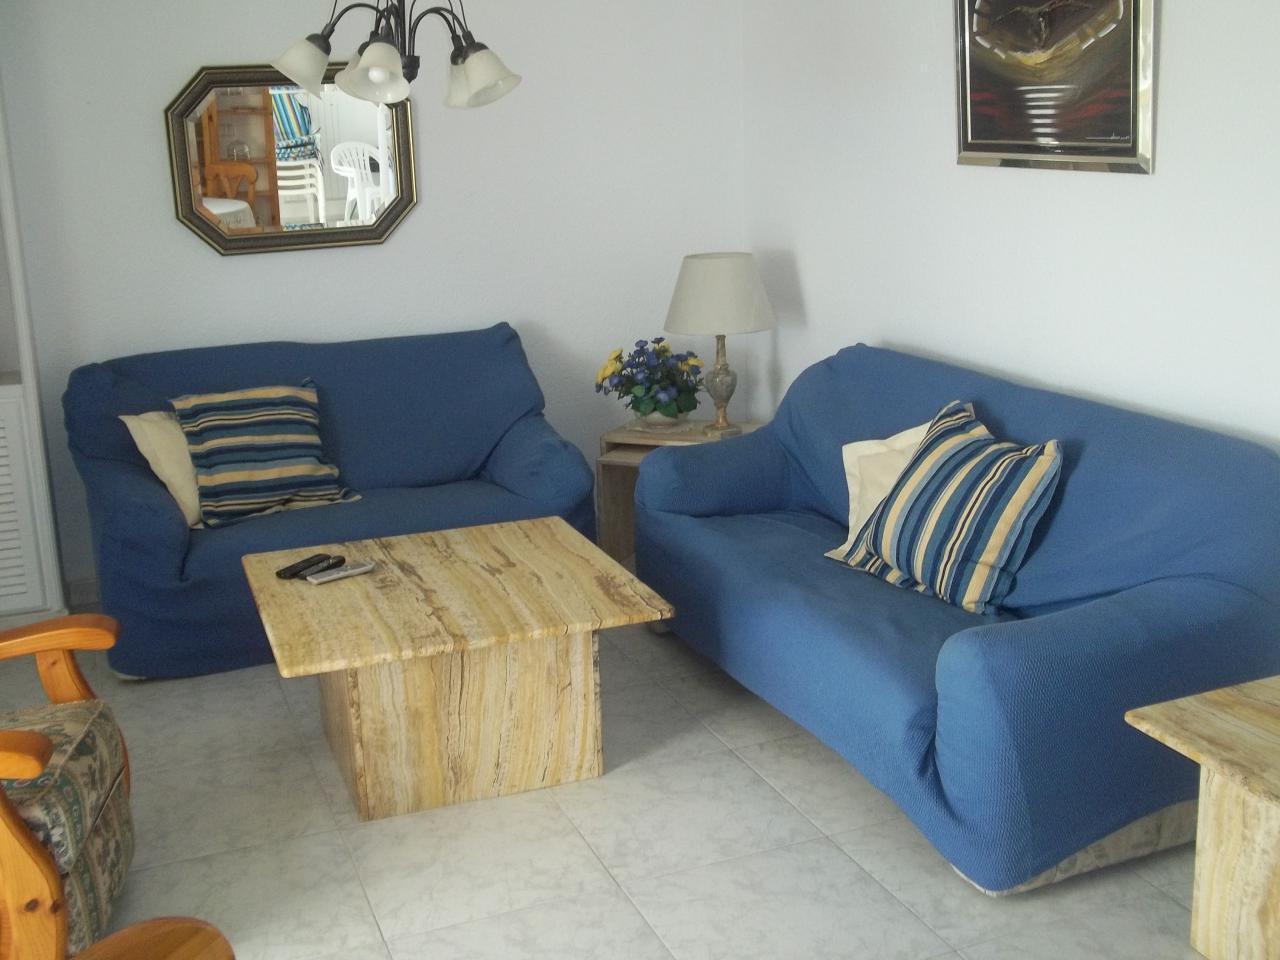 Appartement de vacances Casa Mónica (809602), La Manga del Mar Menor, Costa Calida, Murcie, Espagne, image 22